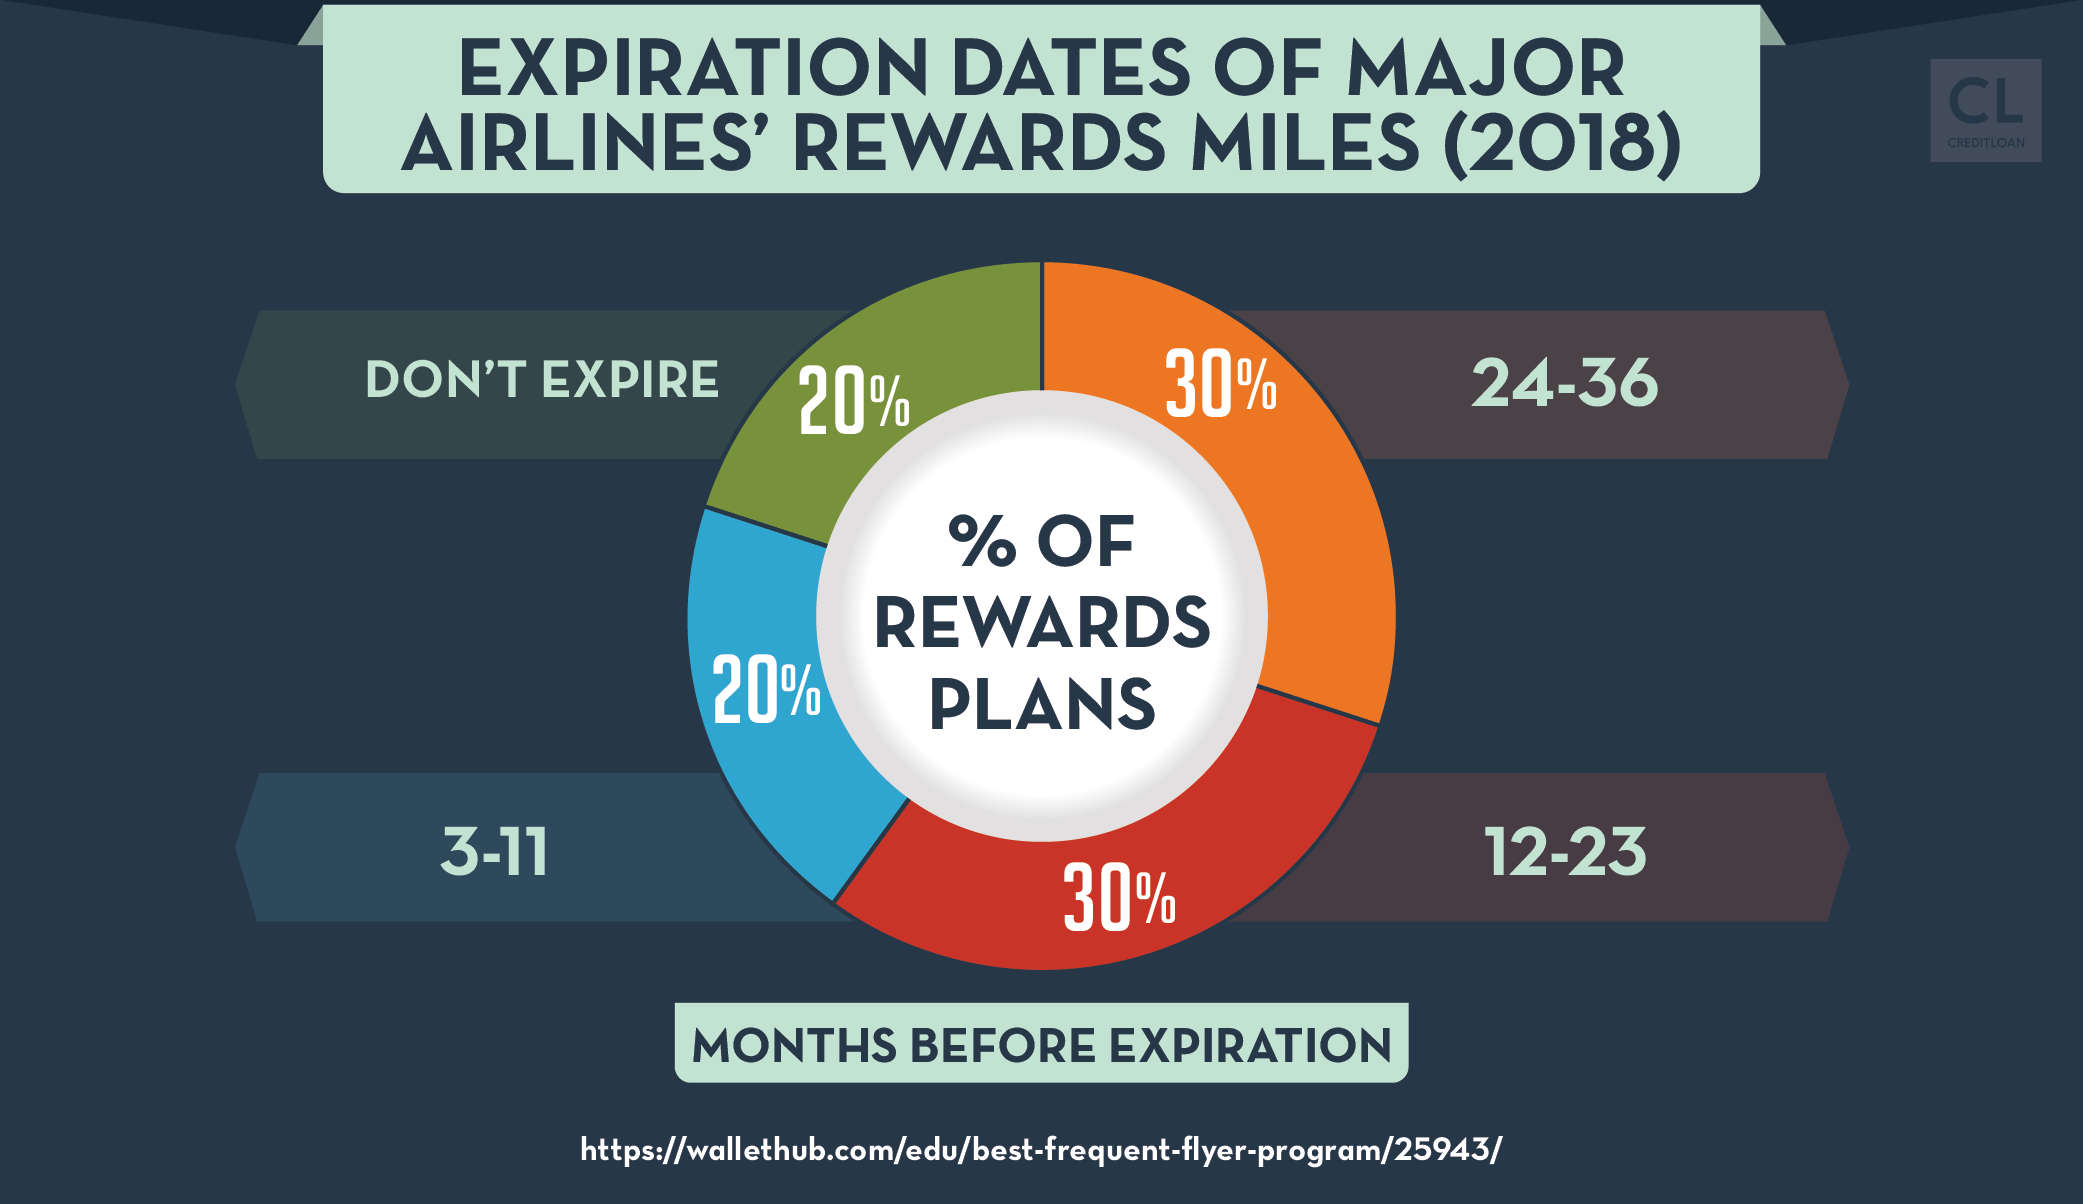 Expiration Dates of Major Airlines' Rewards Miles